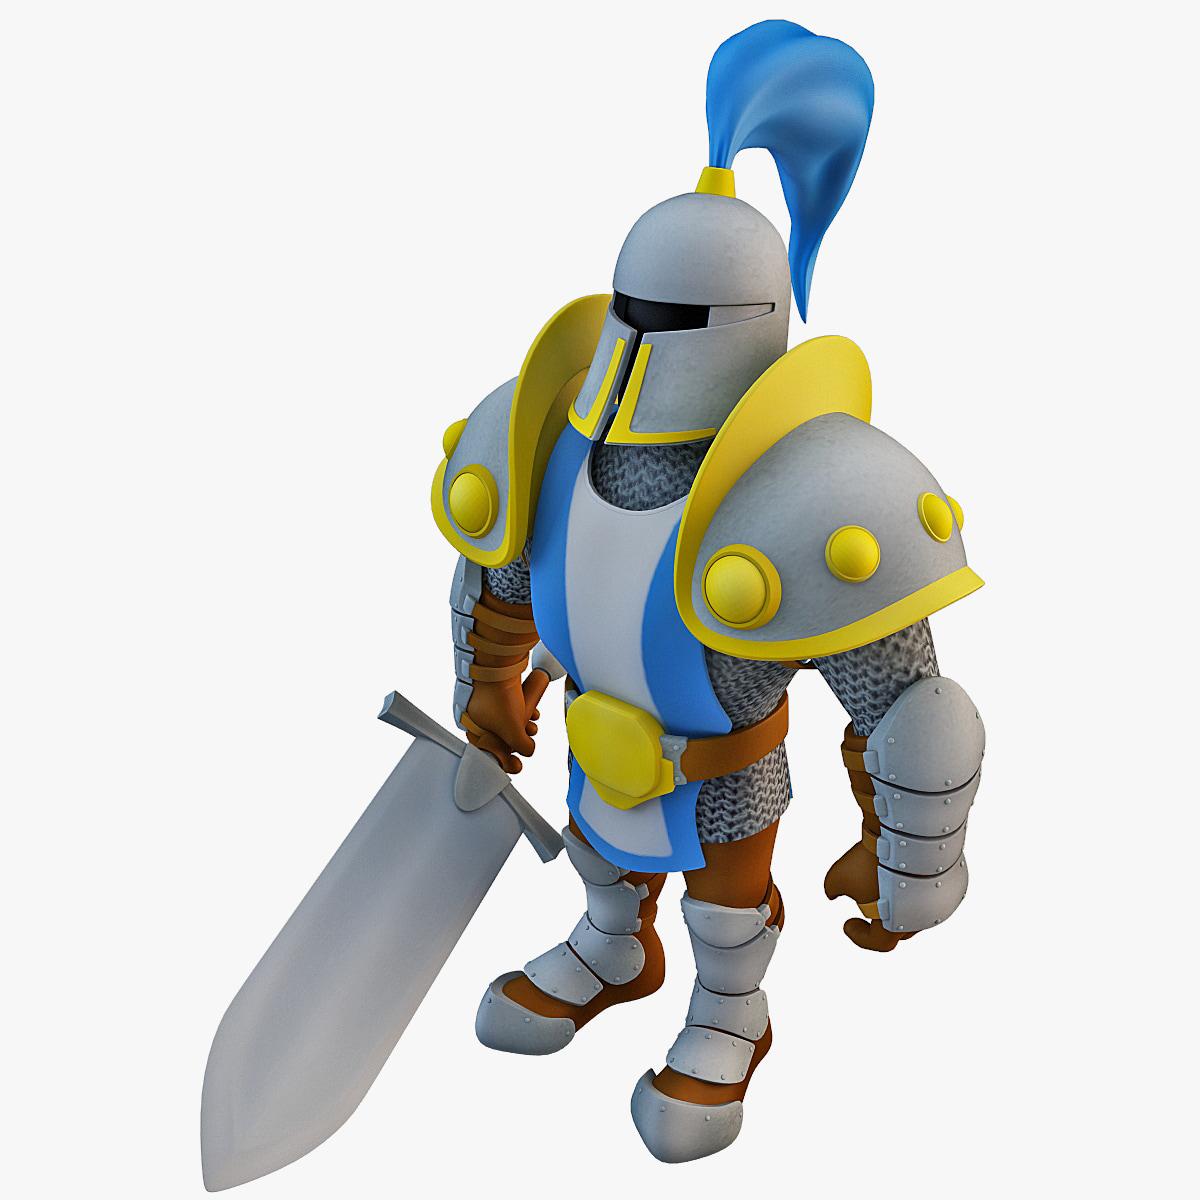 Game_Knight_000.jpg